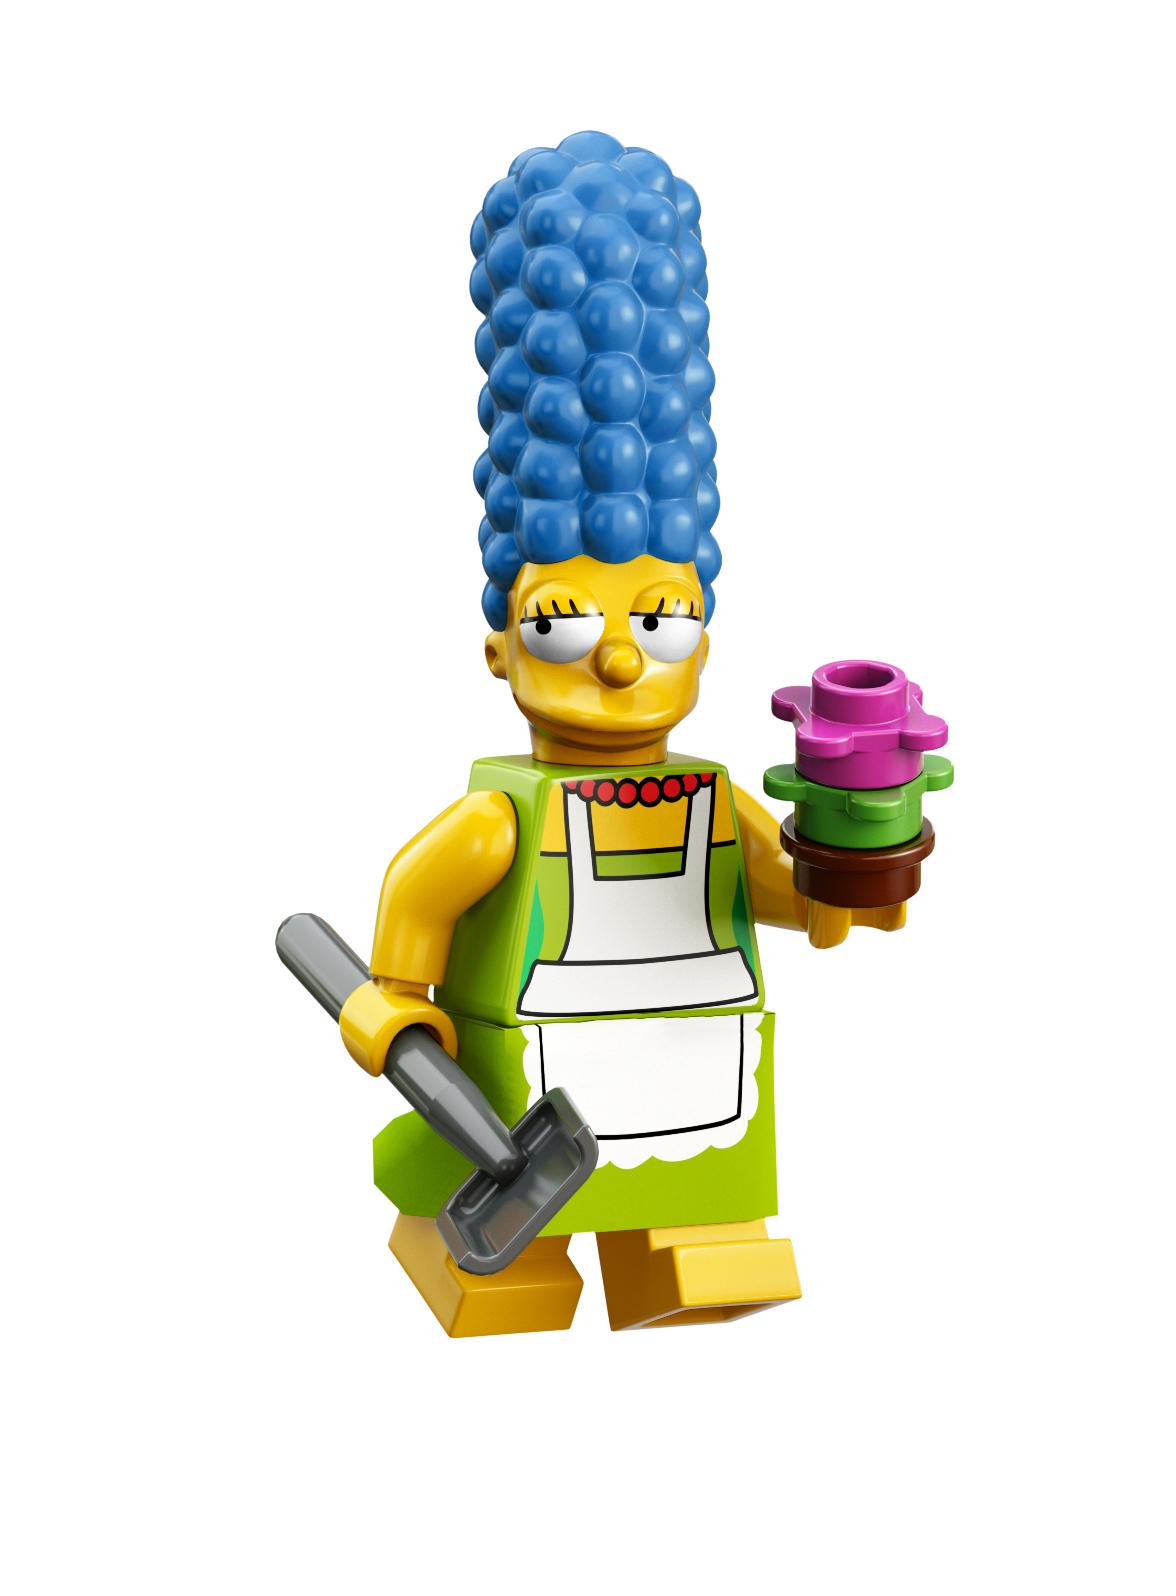 Lego Marge Simpson Minifig